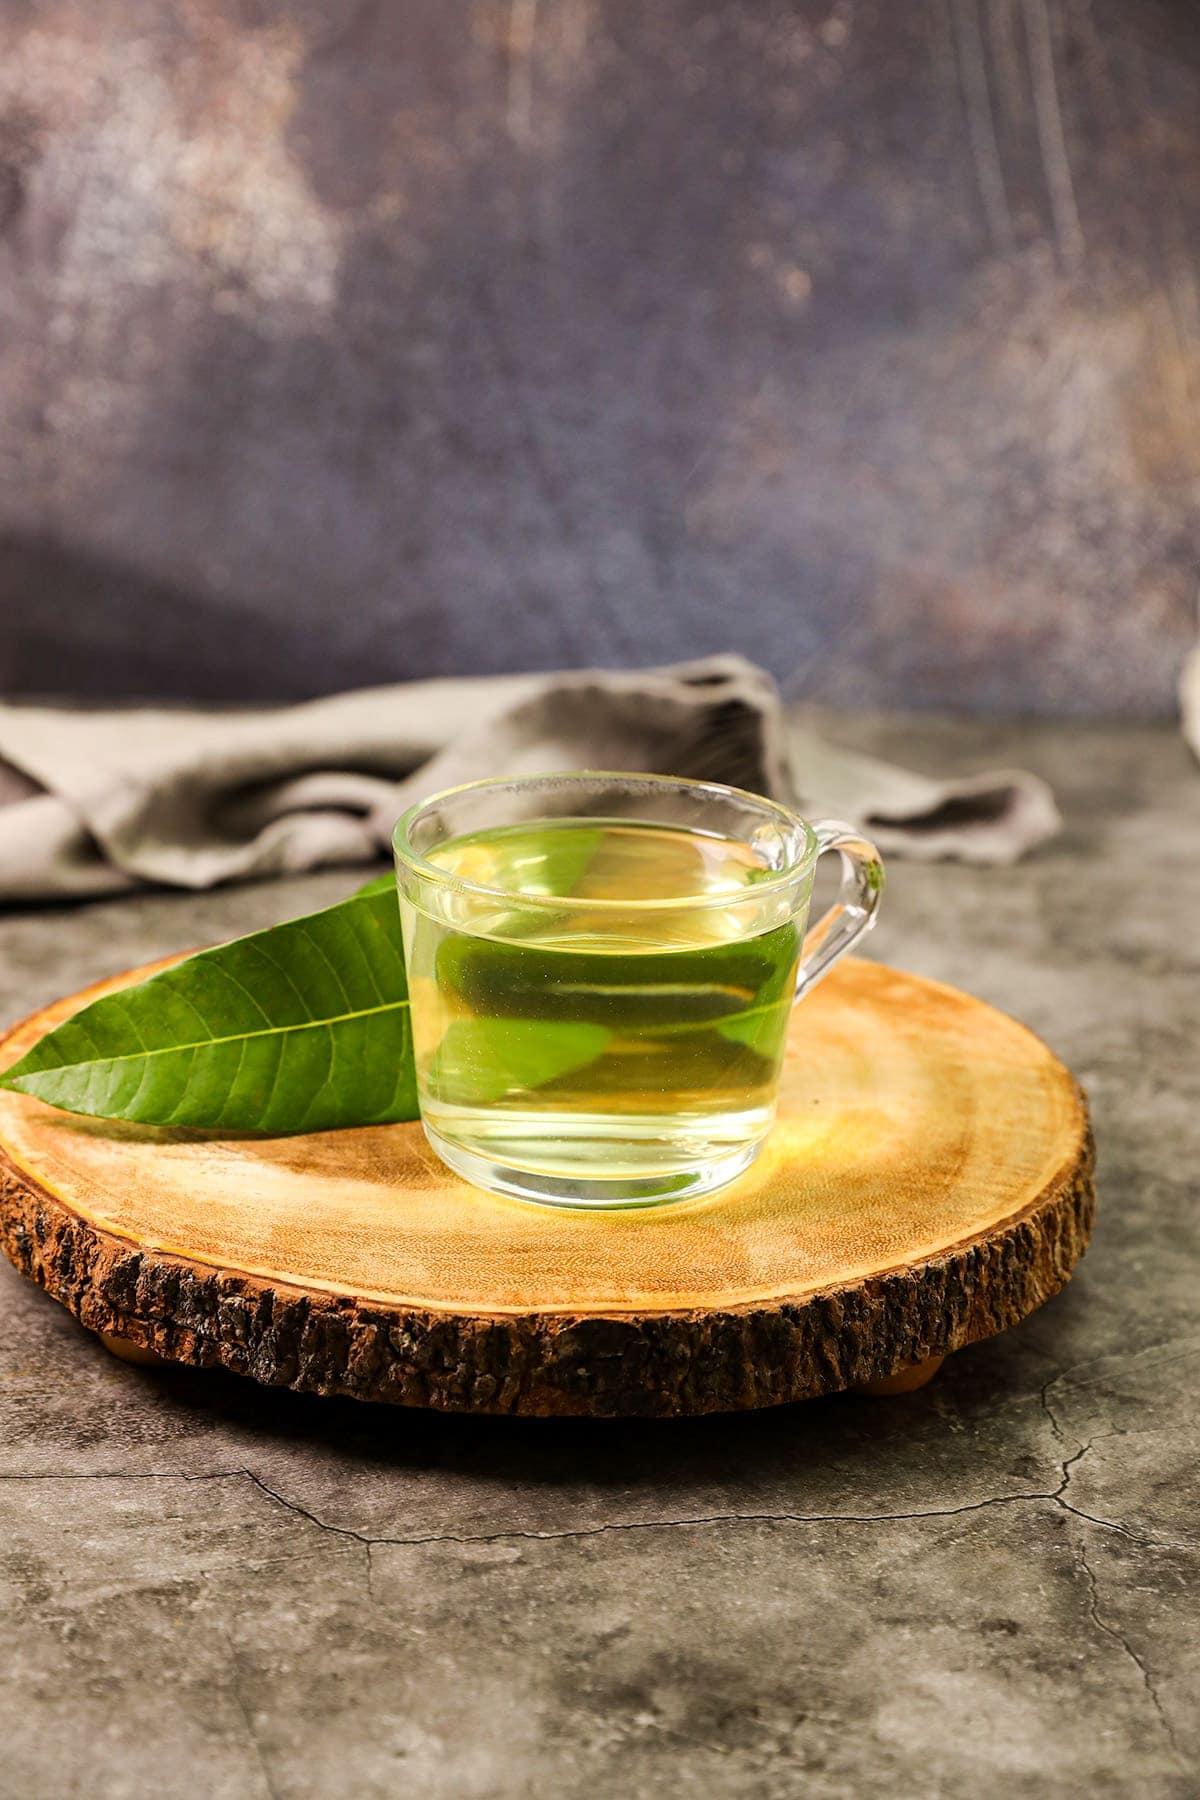 mango leaf tea in glass cup